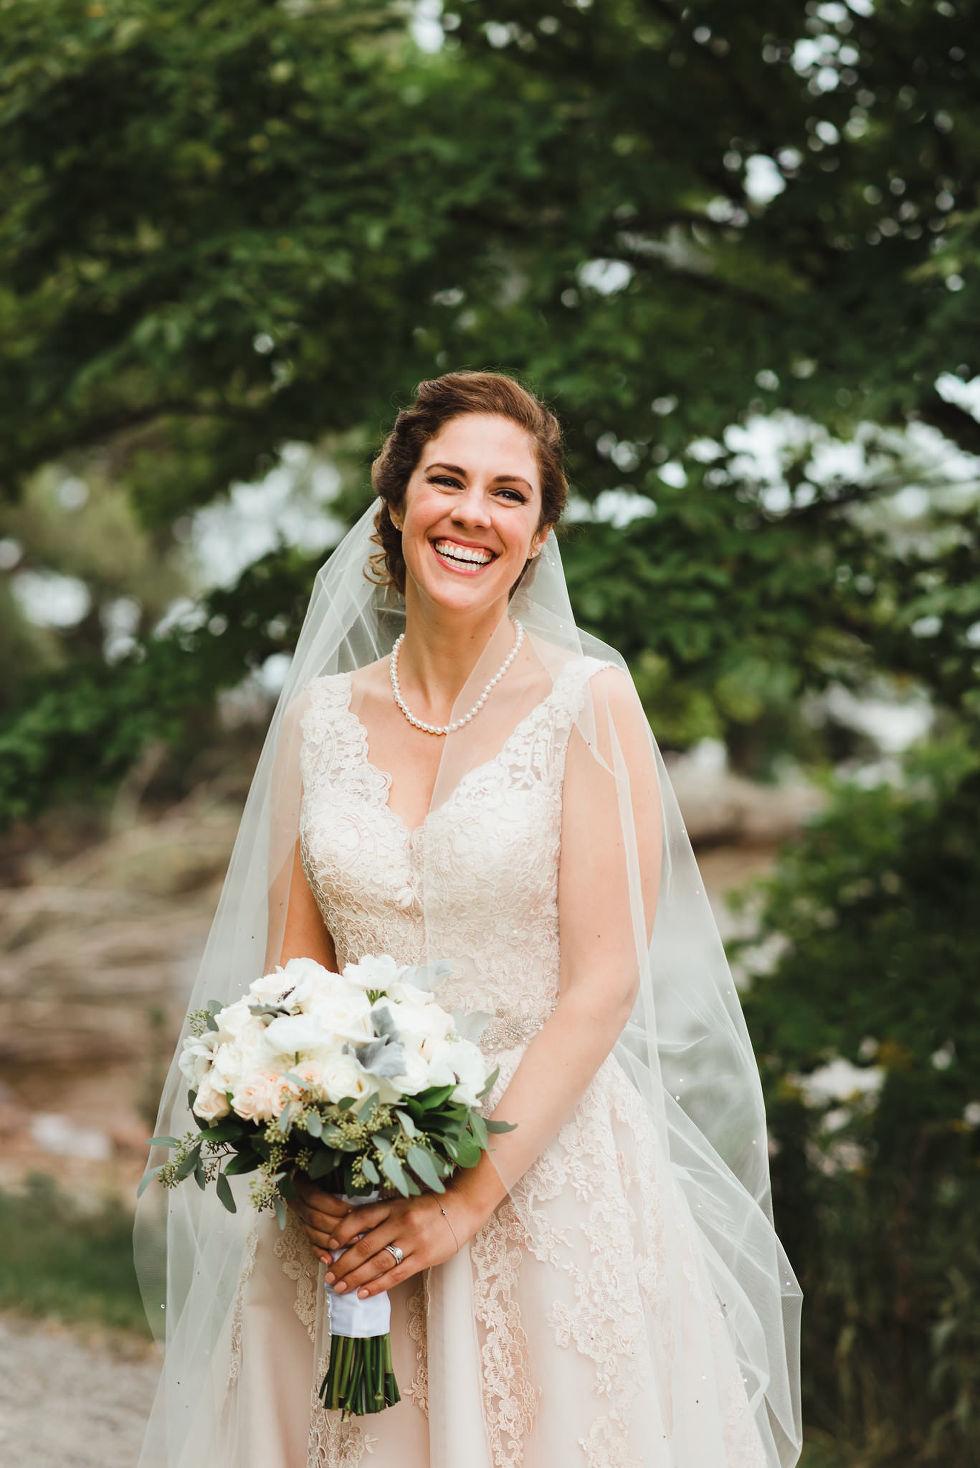 bride with huge smile after no first look wedding ceremony at La Paletta Mansion in Burlington Ontario